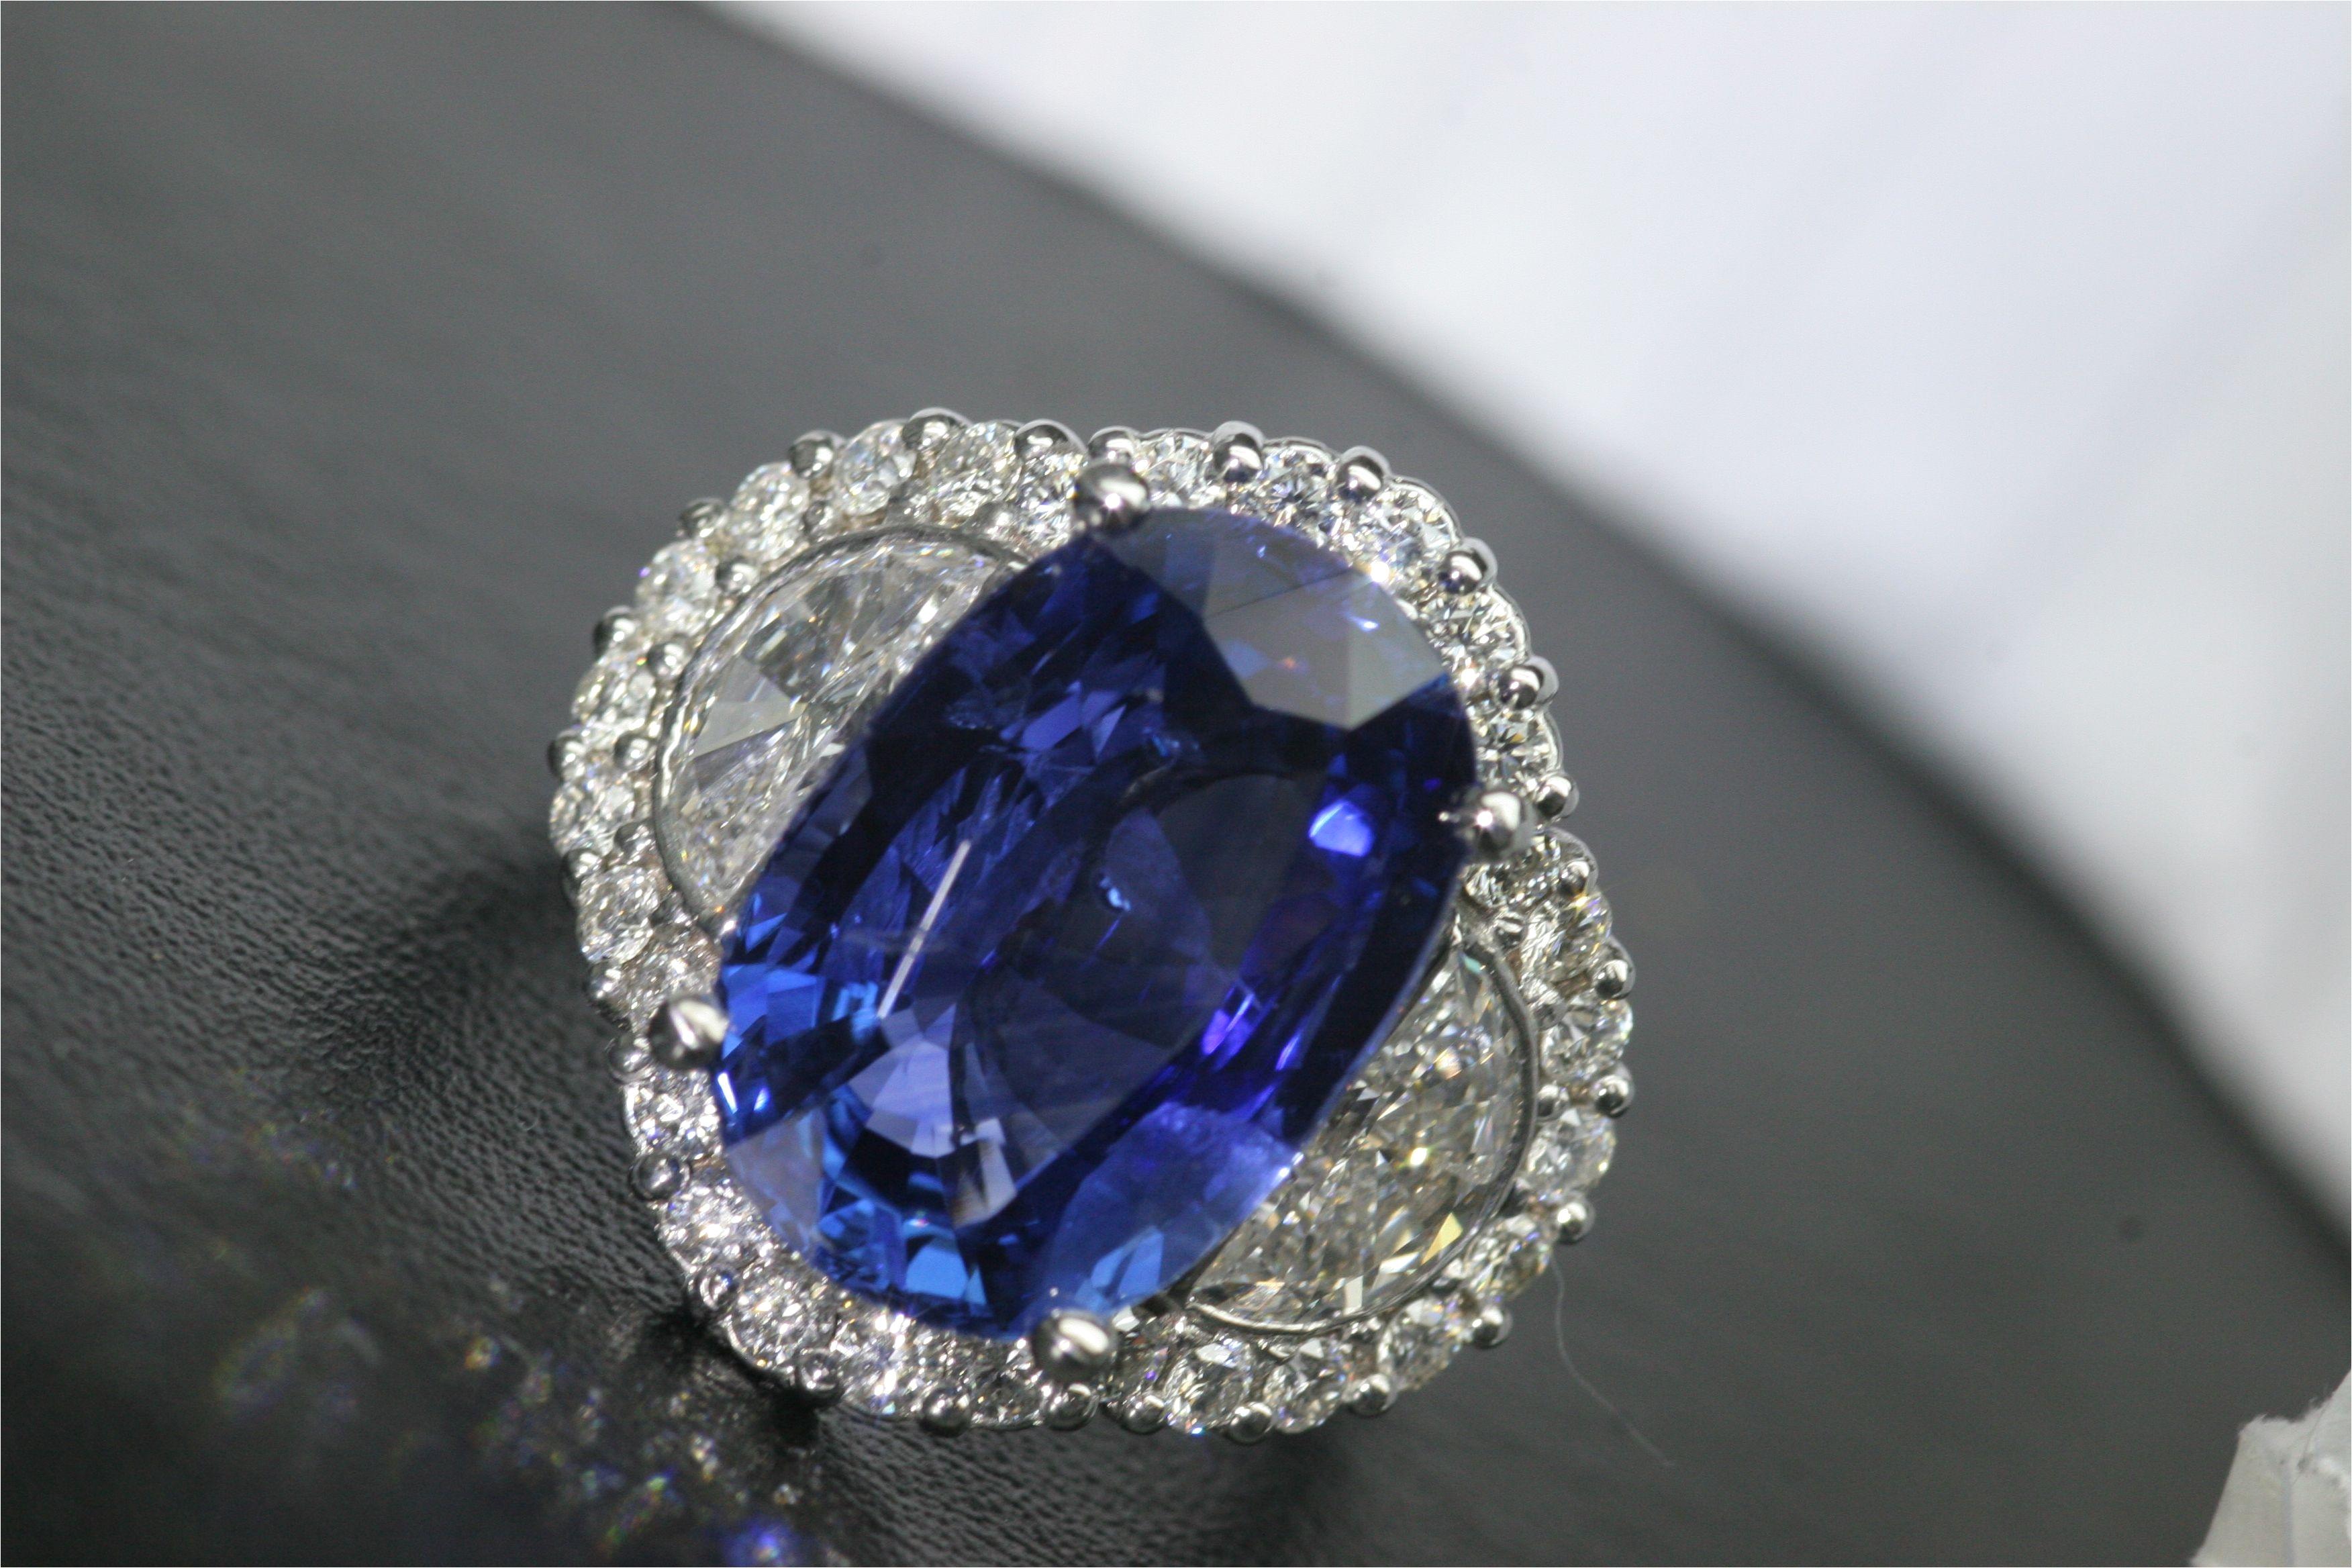 graceful engagement rings light blue diamonds on a 4 25 carat oval sapphire with halo od surrounding diamonds